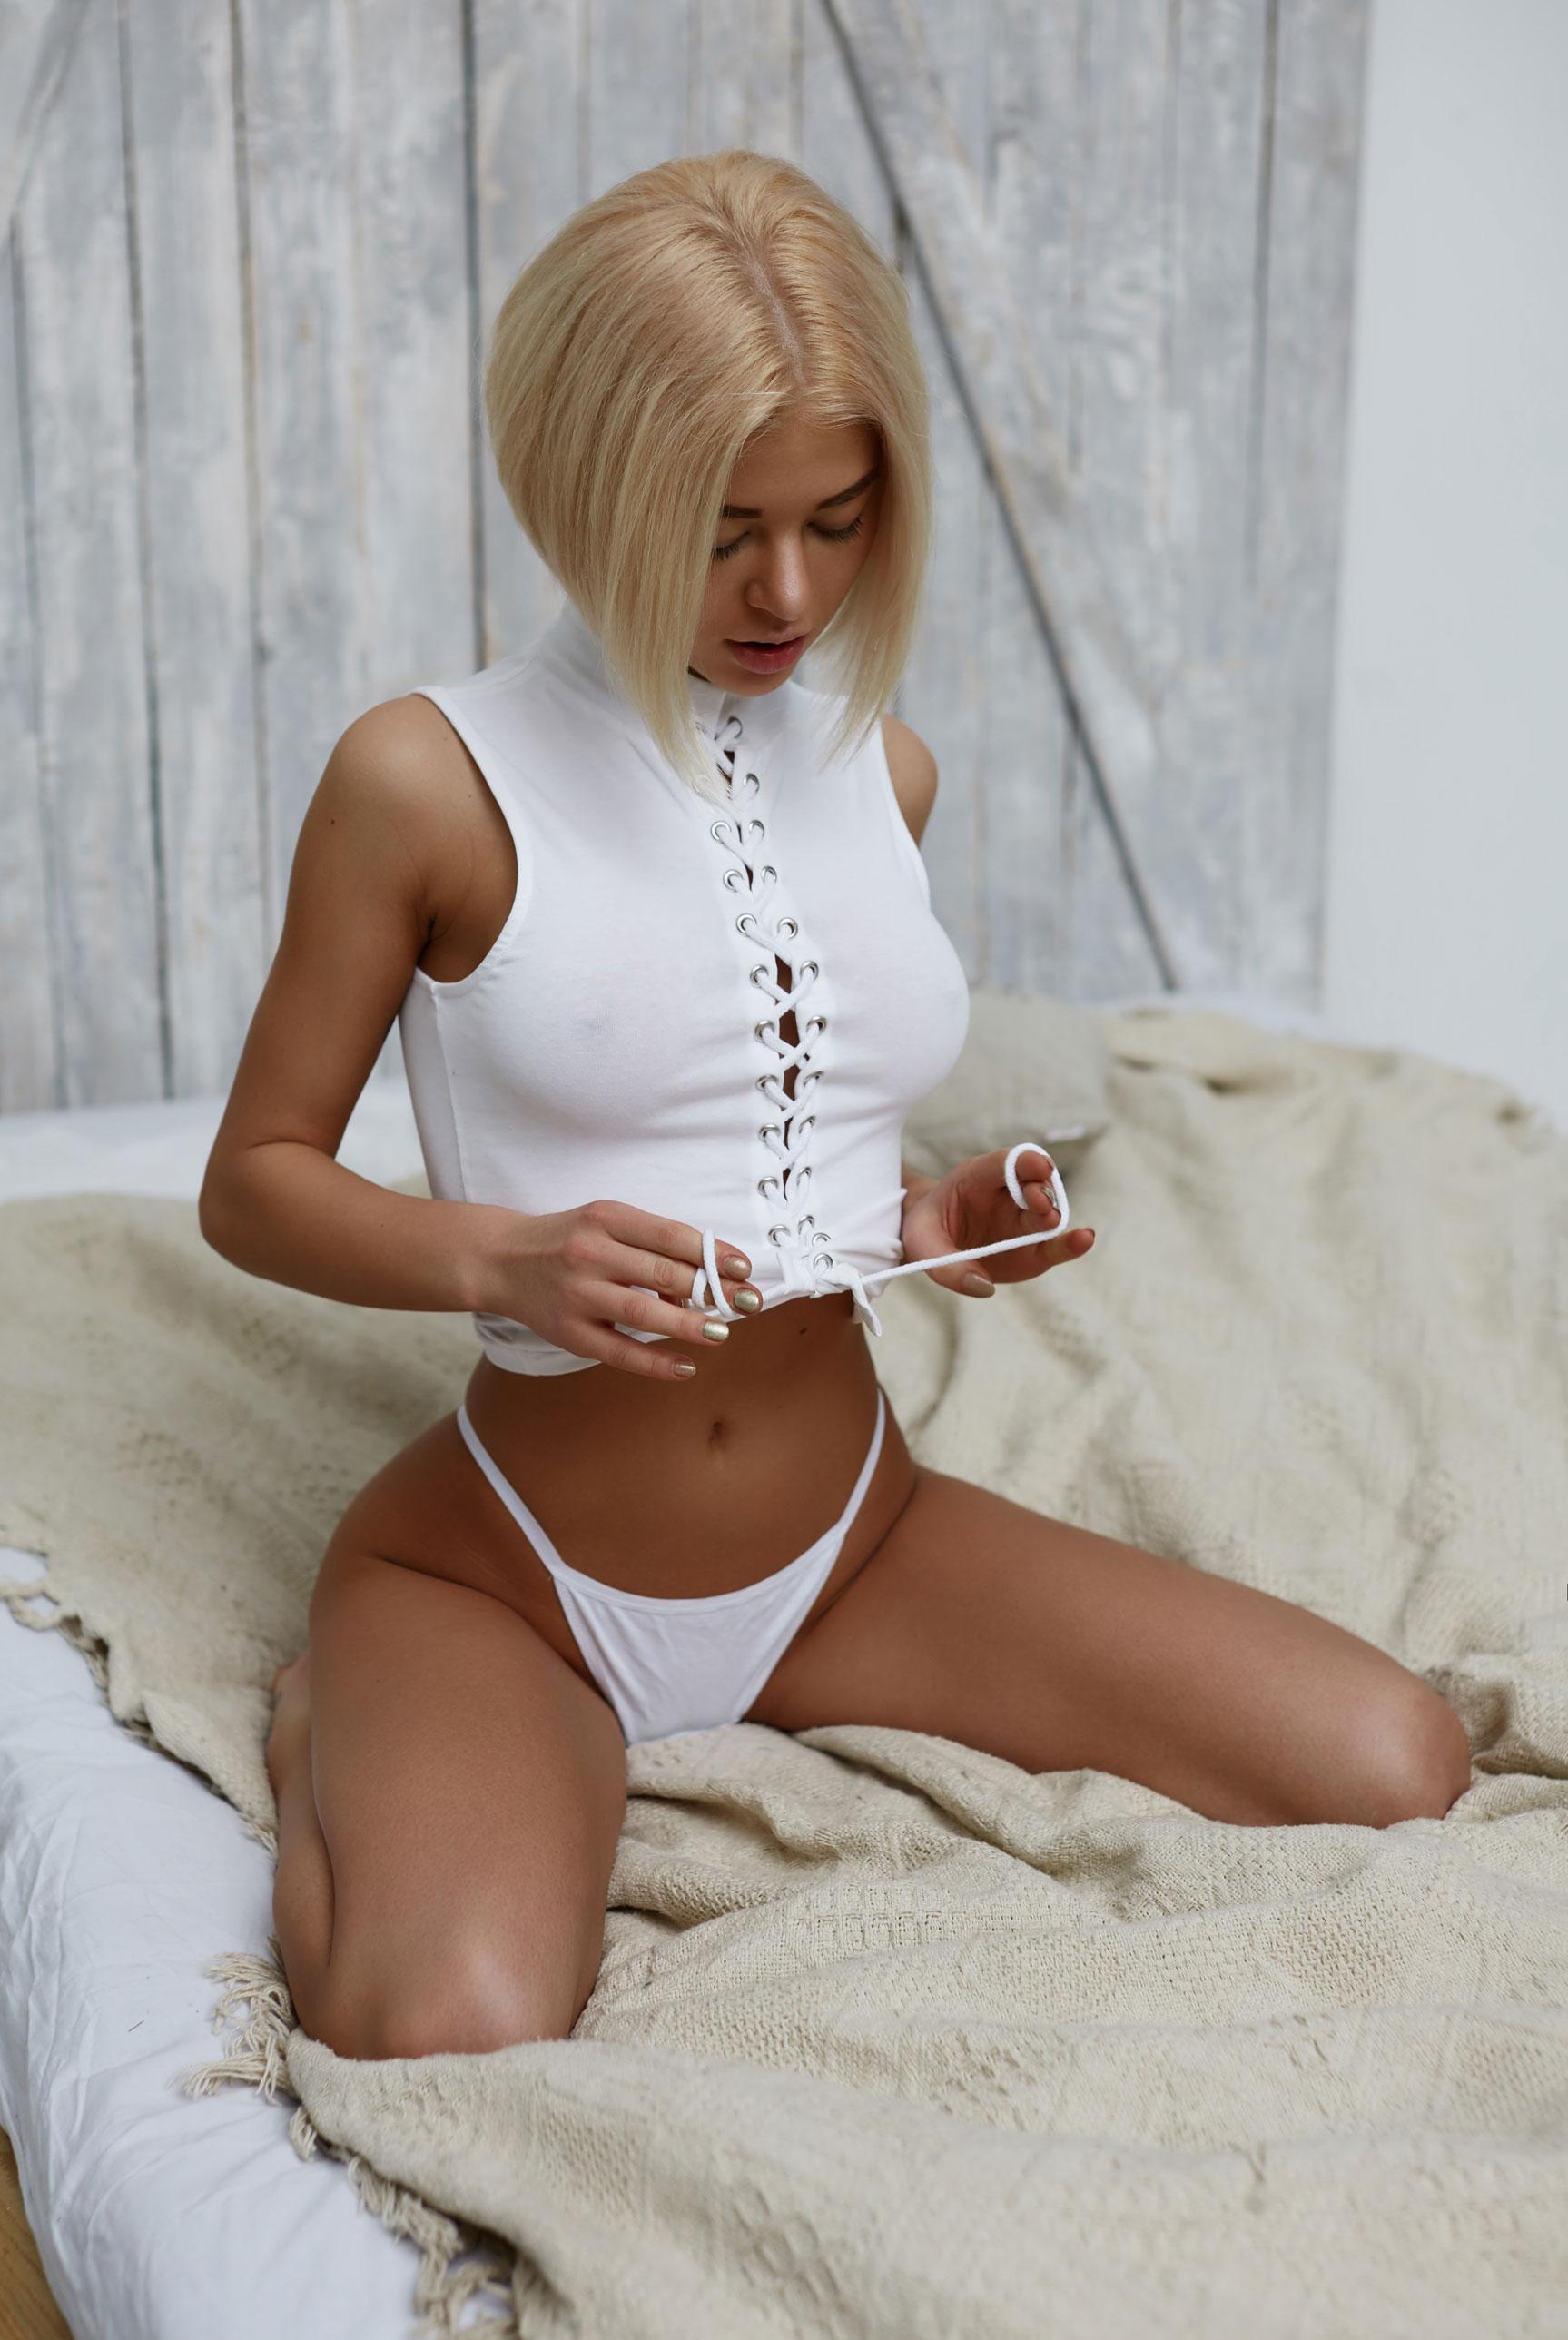 Жанна Павлова / Janna Pavlova by Dmitriy Lobanov